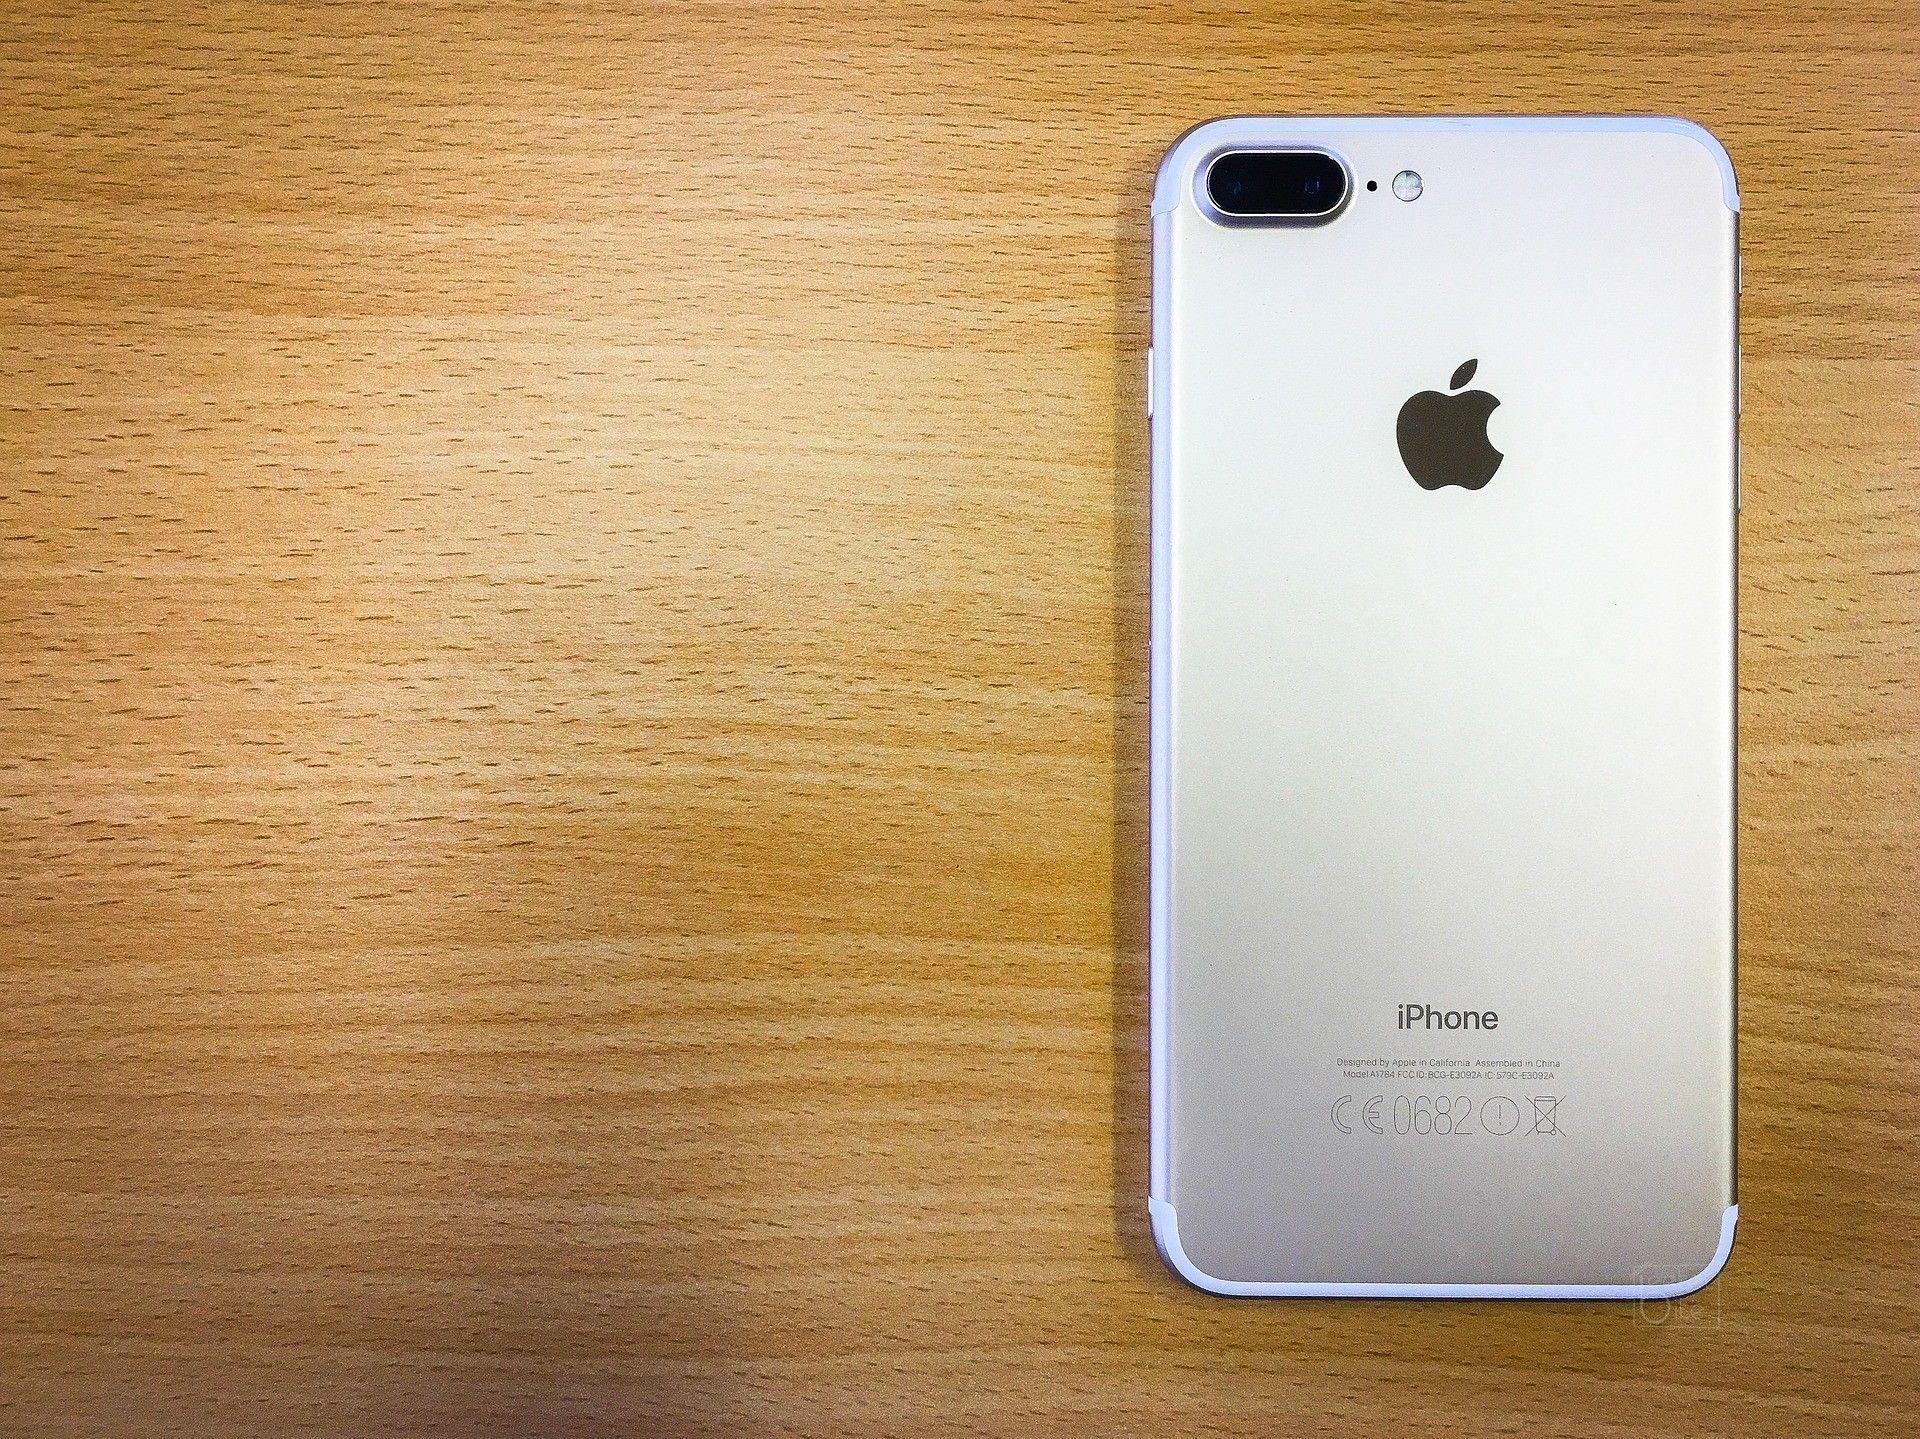 Sweepstake iphone 7 plus rose gold 128gb